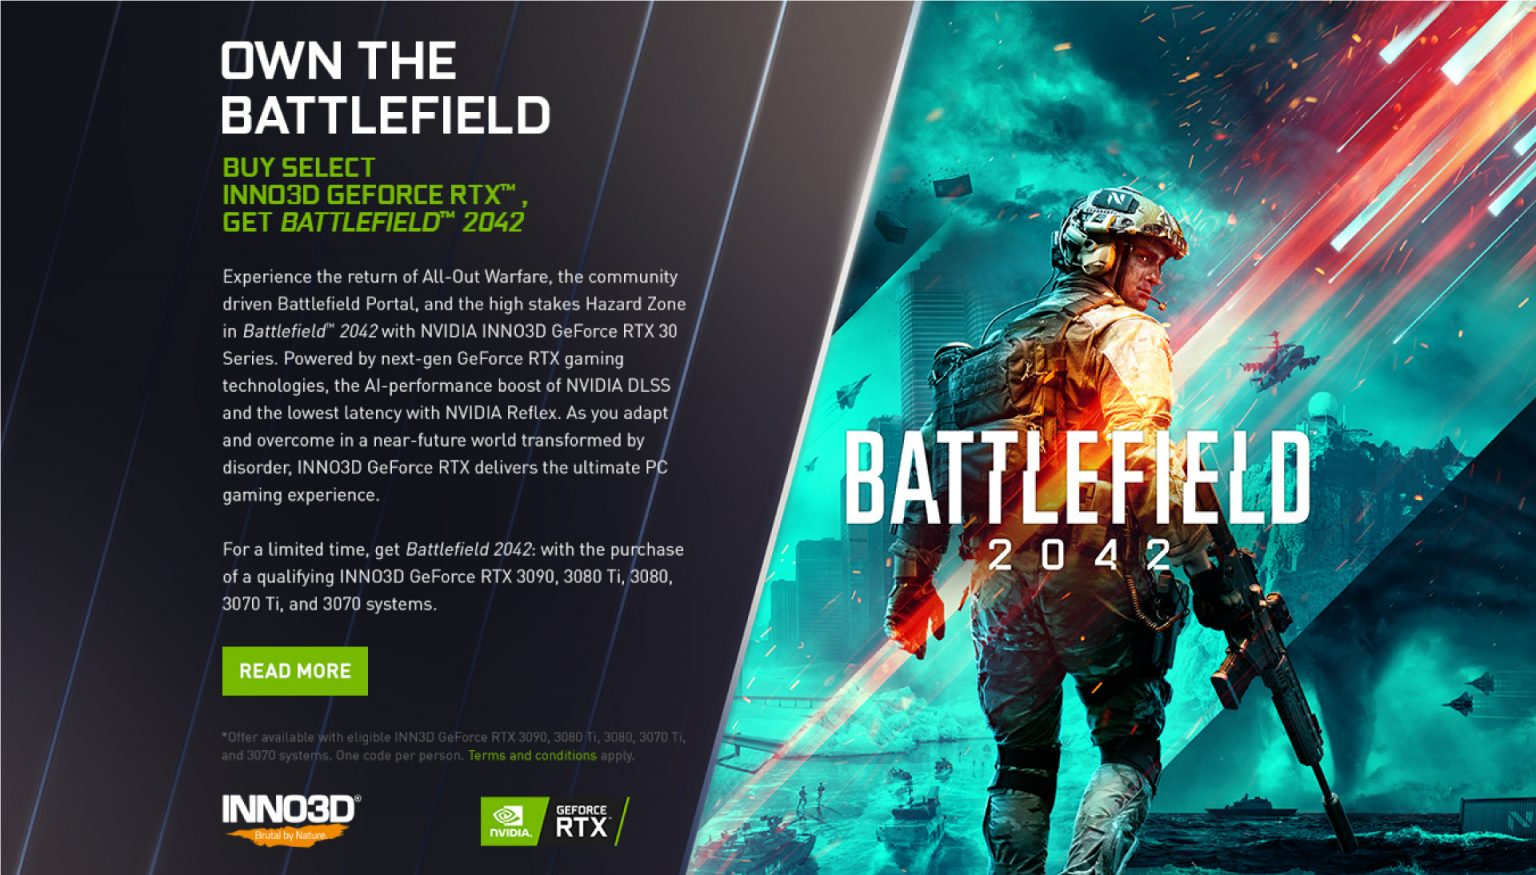 NVIDIA-RTX-30-Battlefield-2042-1.jpg